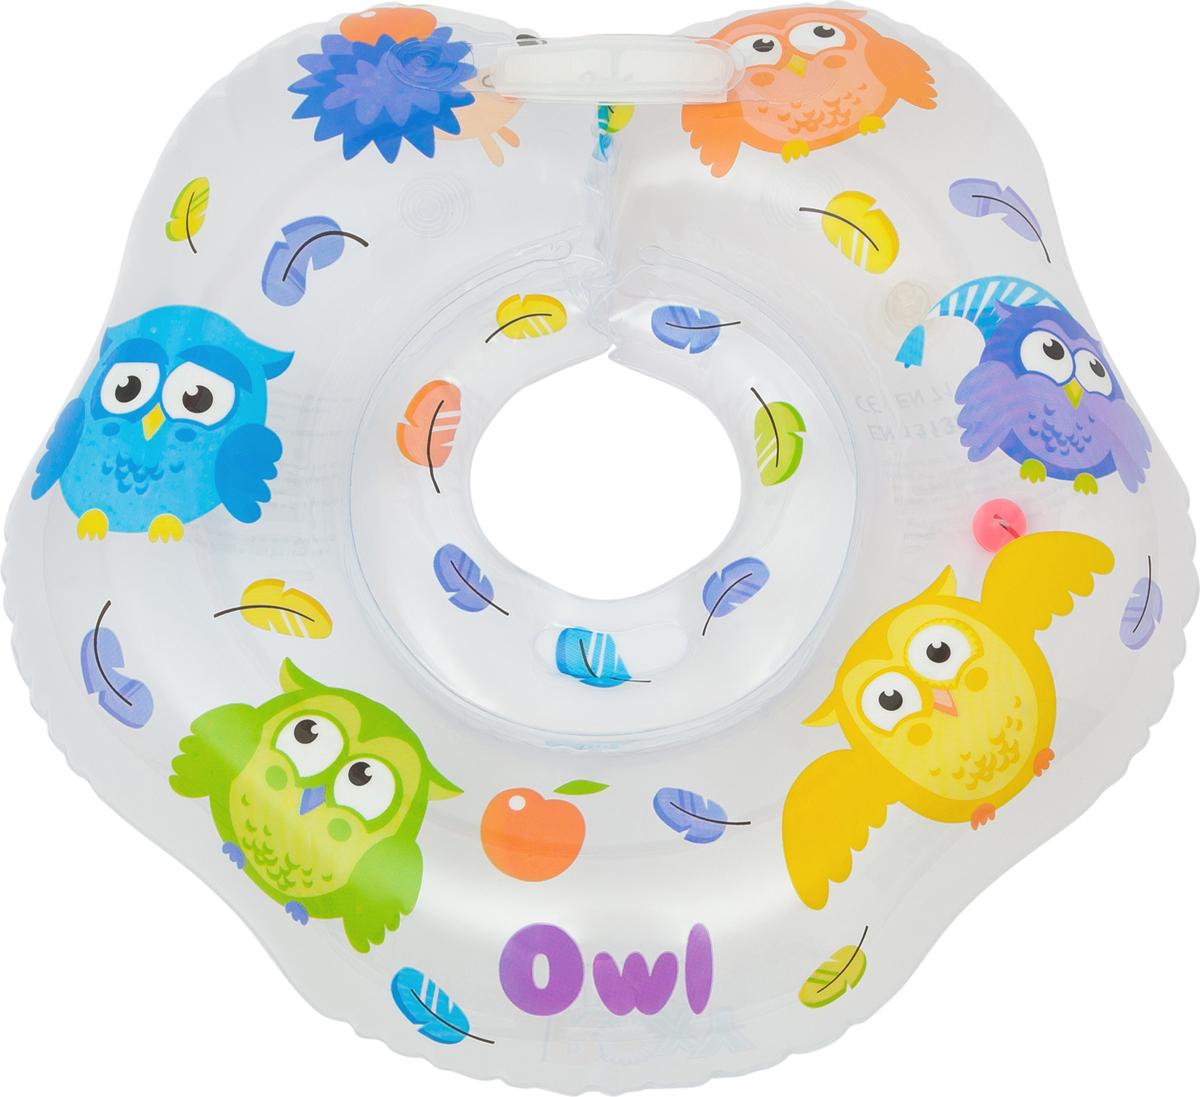 Roxy-kids Круг для купания Owl -  Все для купания